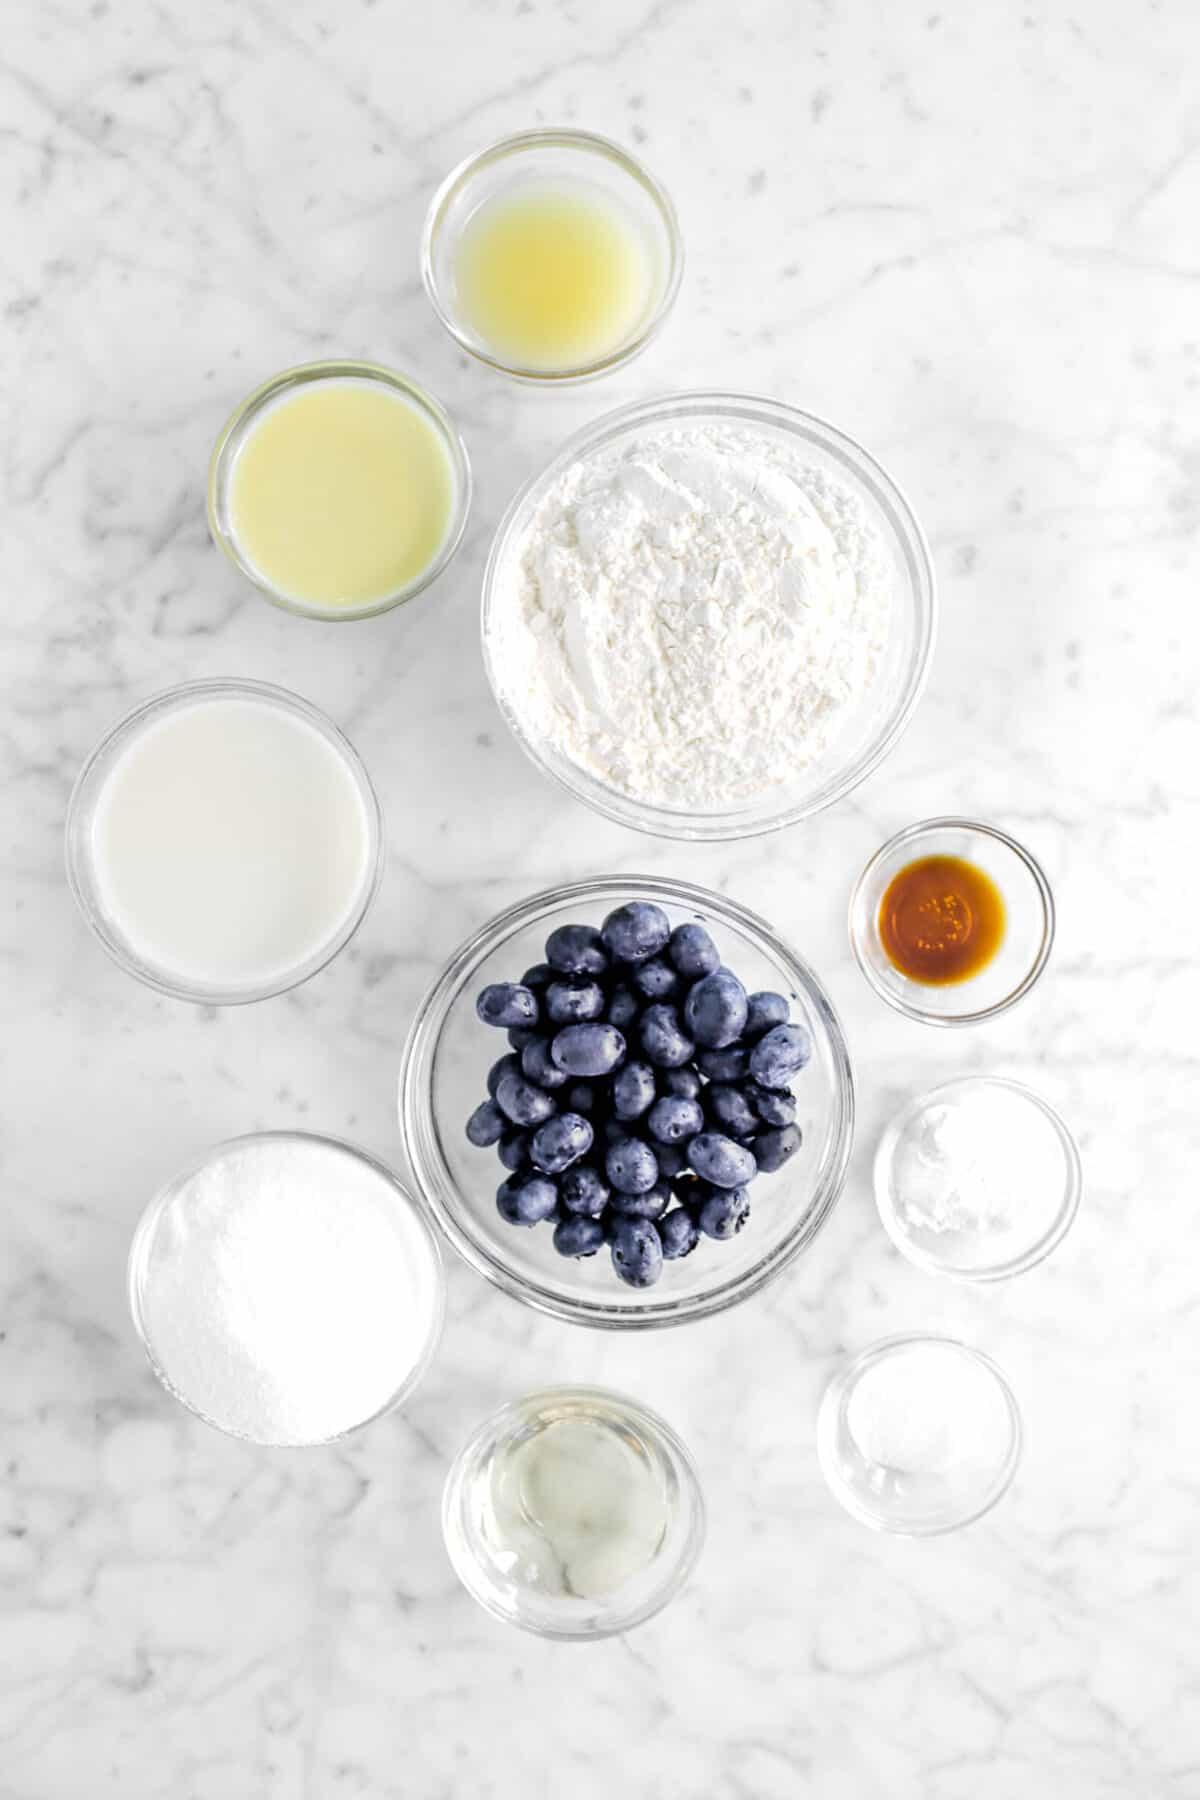 melted butter, egg, milk, sugar, vegetable oil, salt, baking powder, vanilla, blueberries, and flour in glass bowls